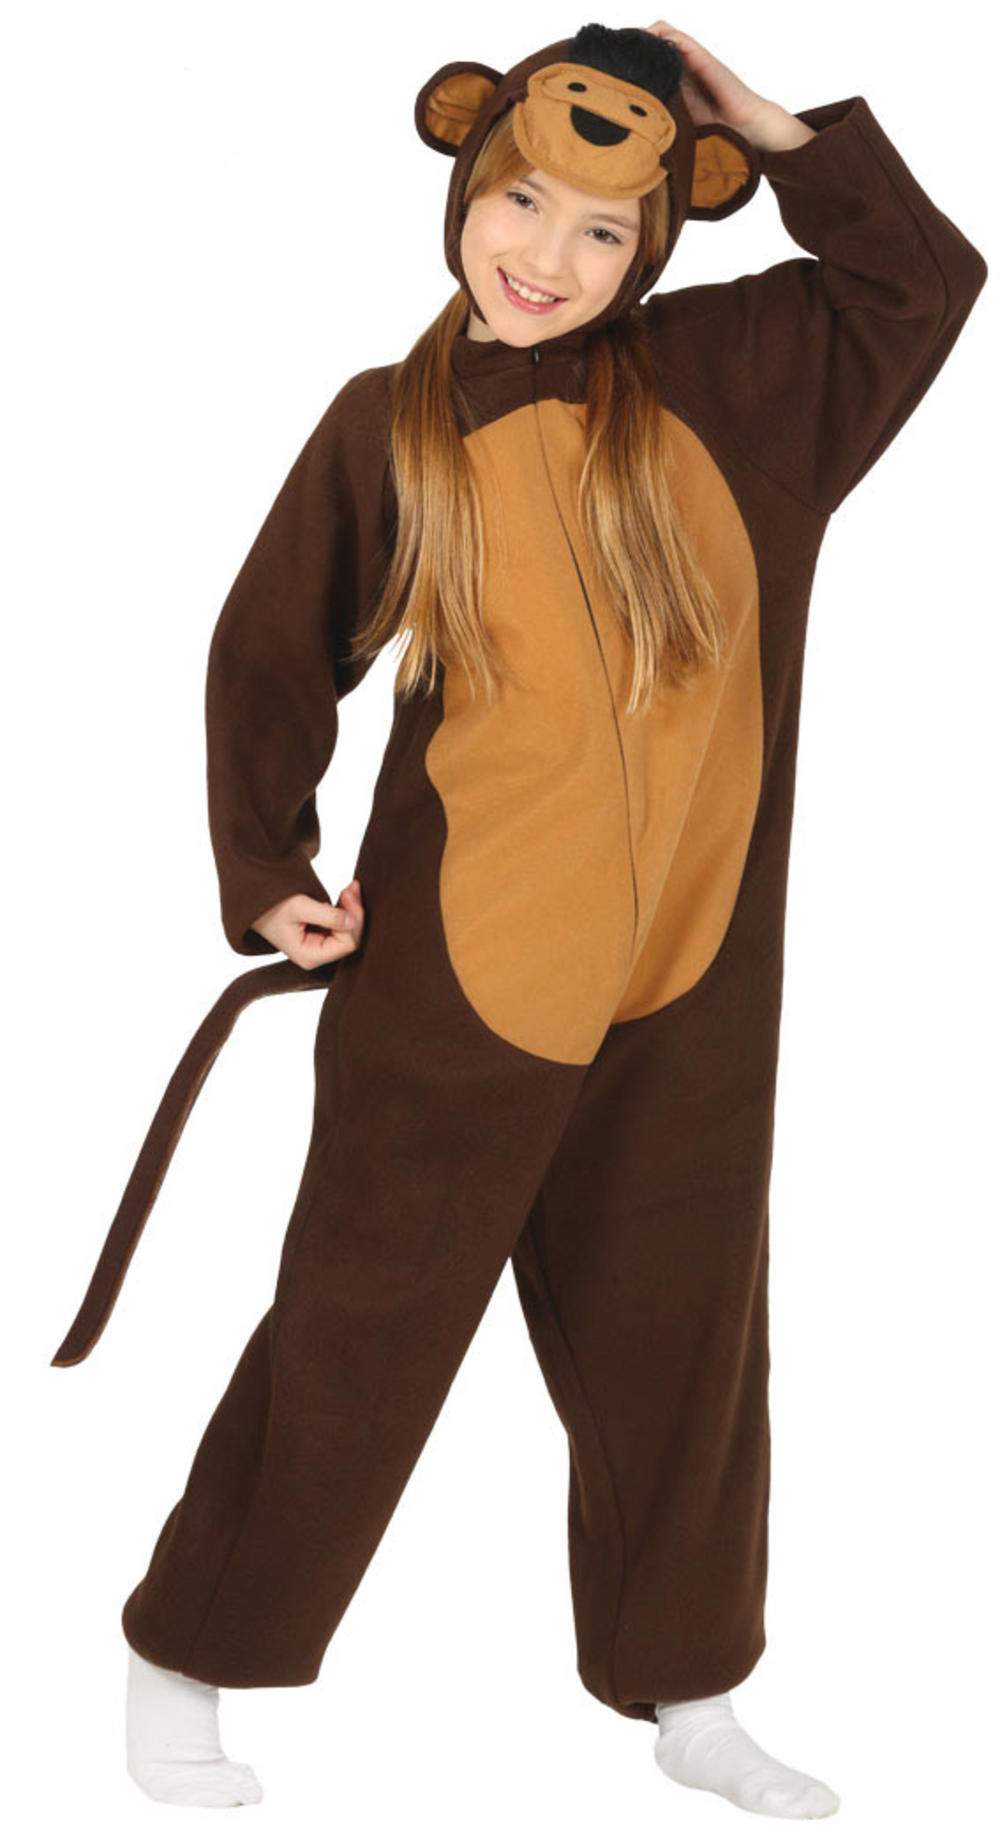 Little Monkey Kids Fancy Dress Animal Boys Girls World Book Day Costume Outfit